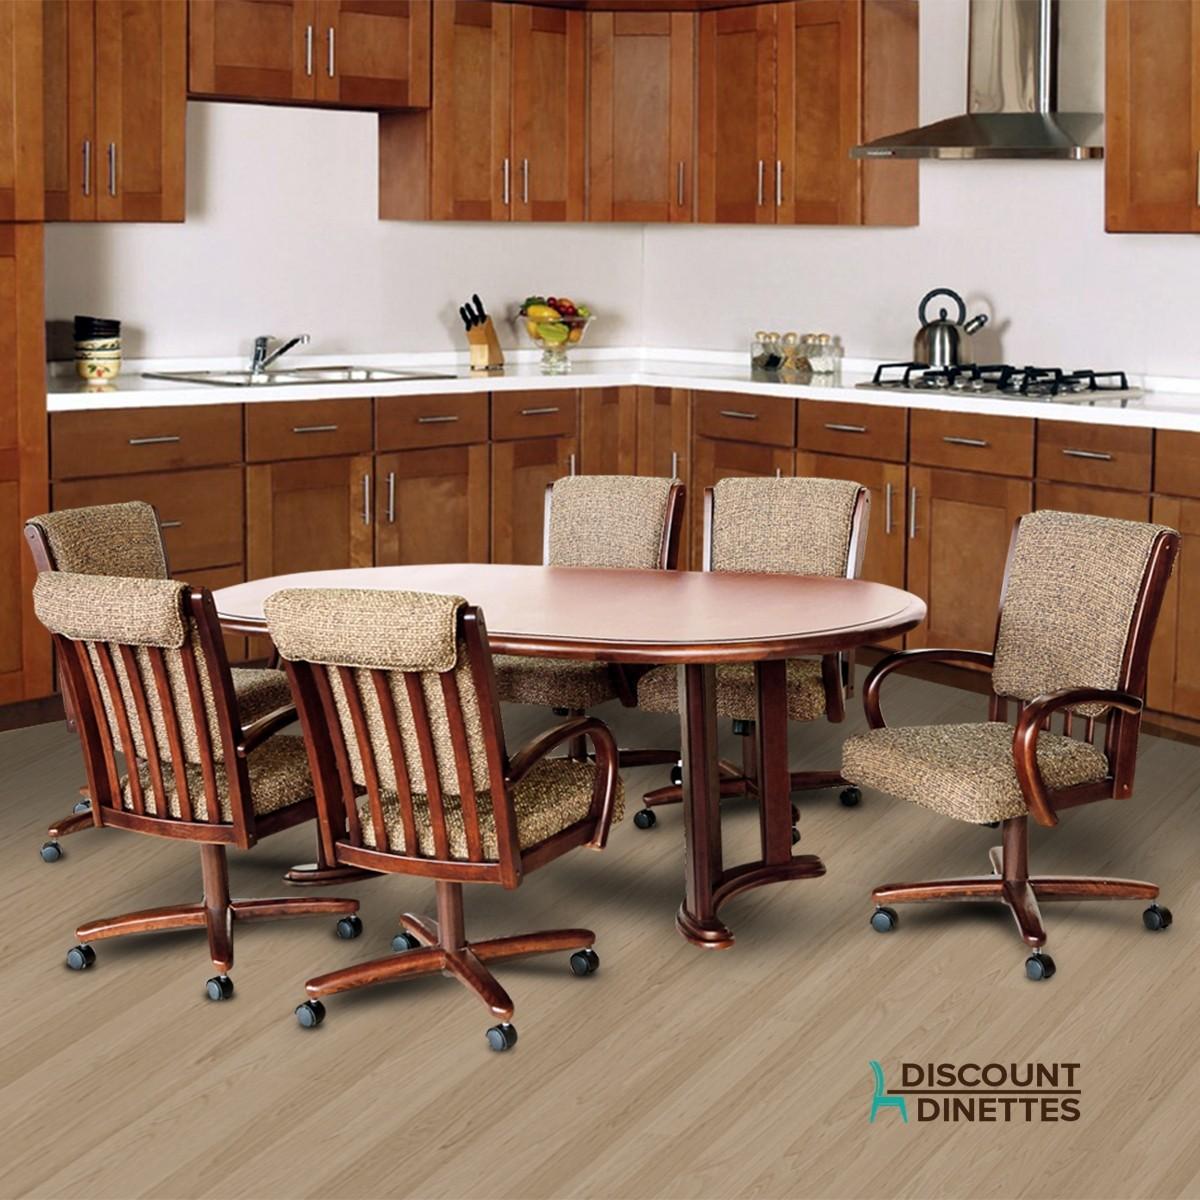 Chromcraft Furniture T817-77 And C177-936 Swivel Wood Dining